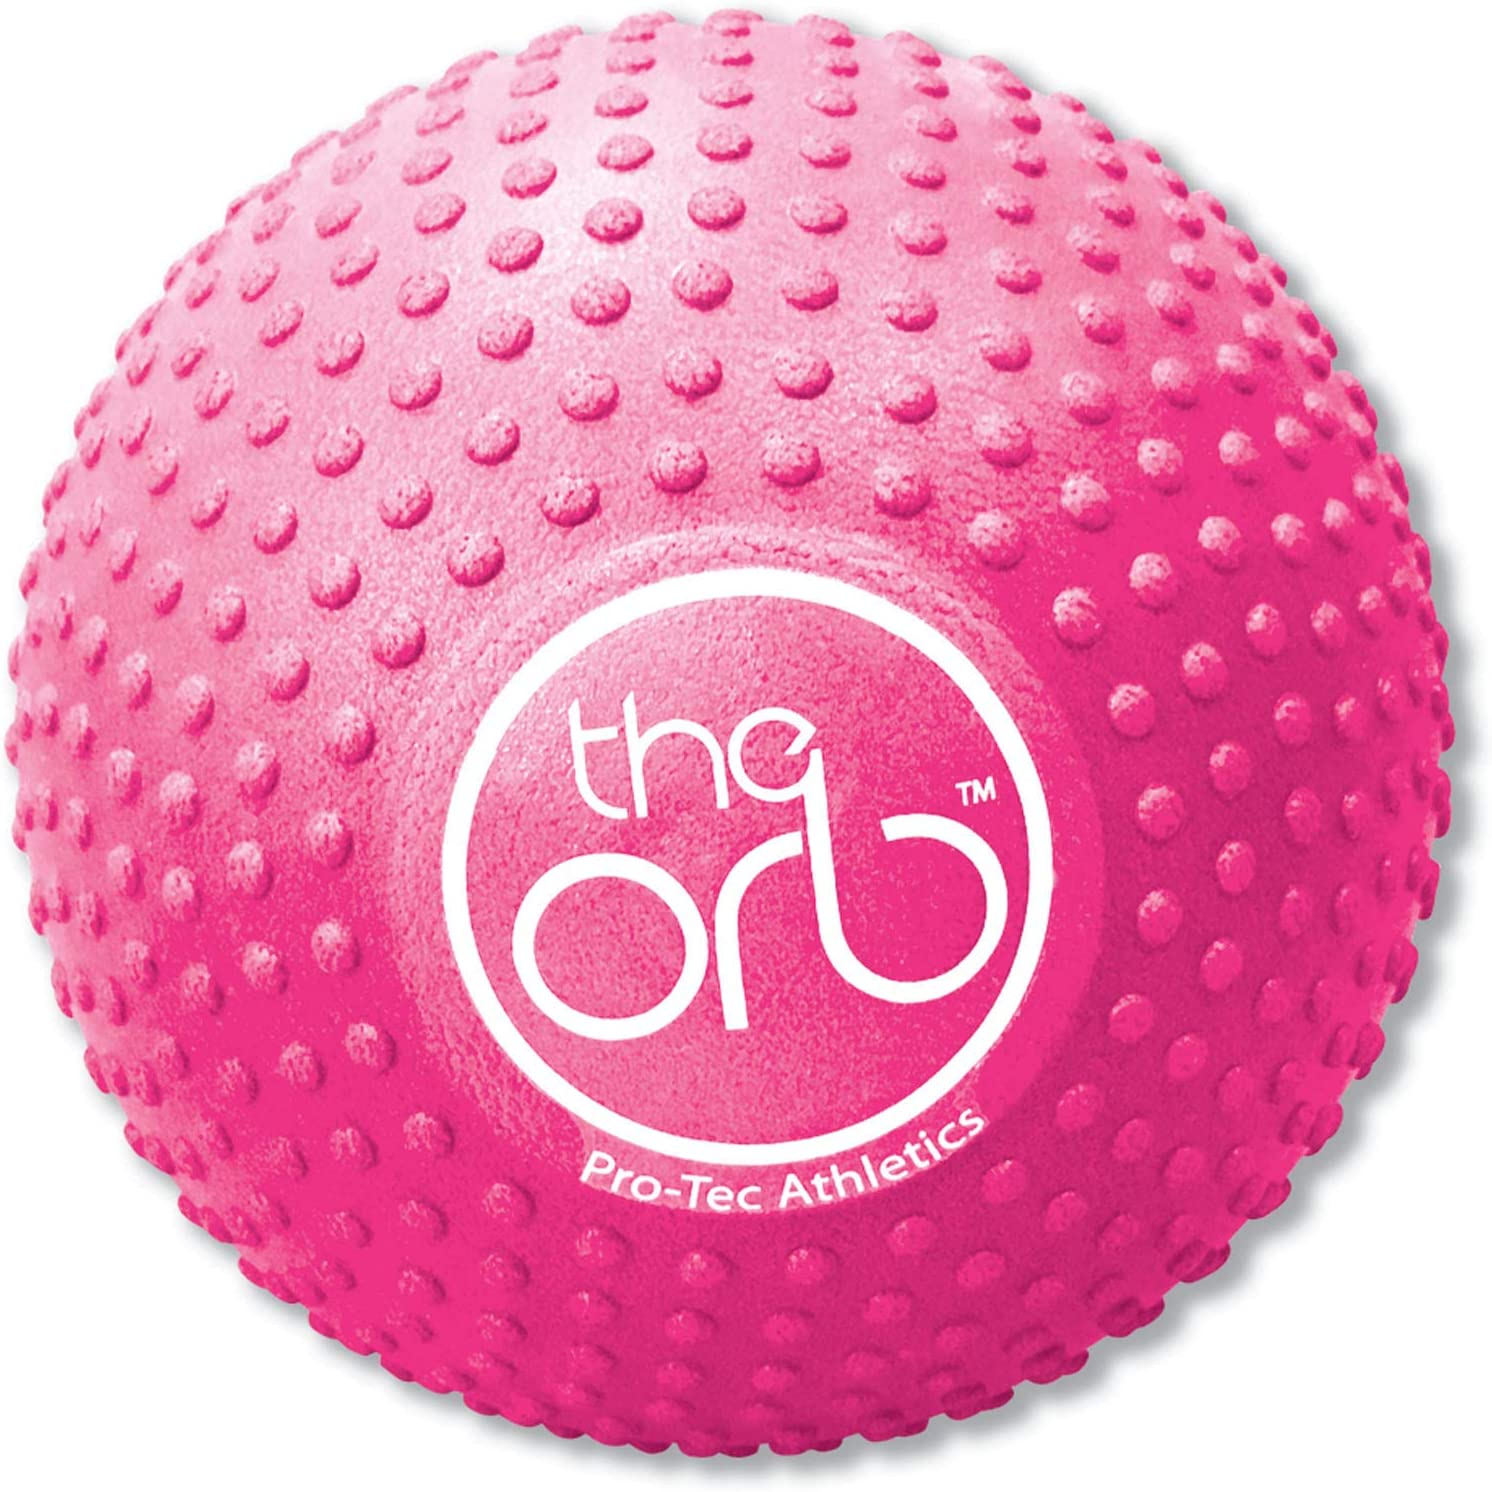 Pro-Tec Athletics Orb, Orb Extreme and Orb Extreme mini mobility massage balls